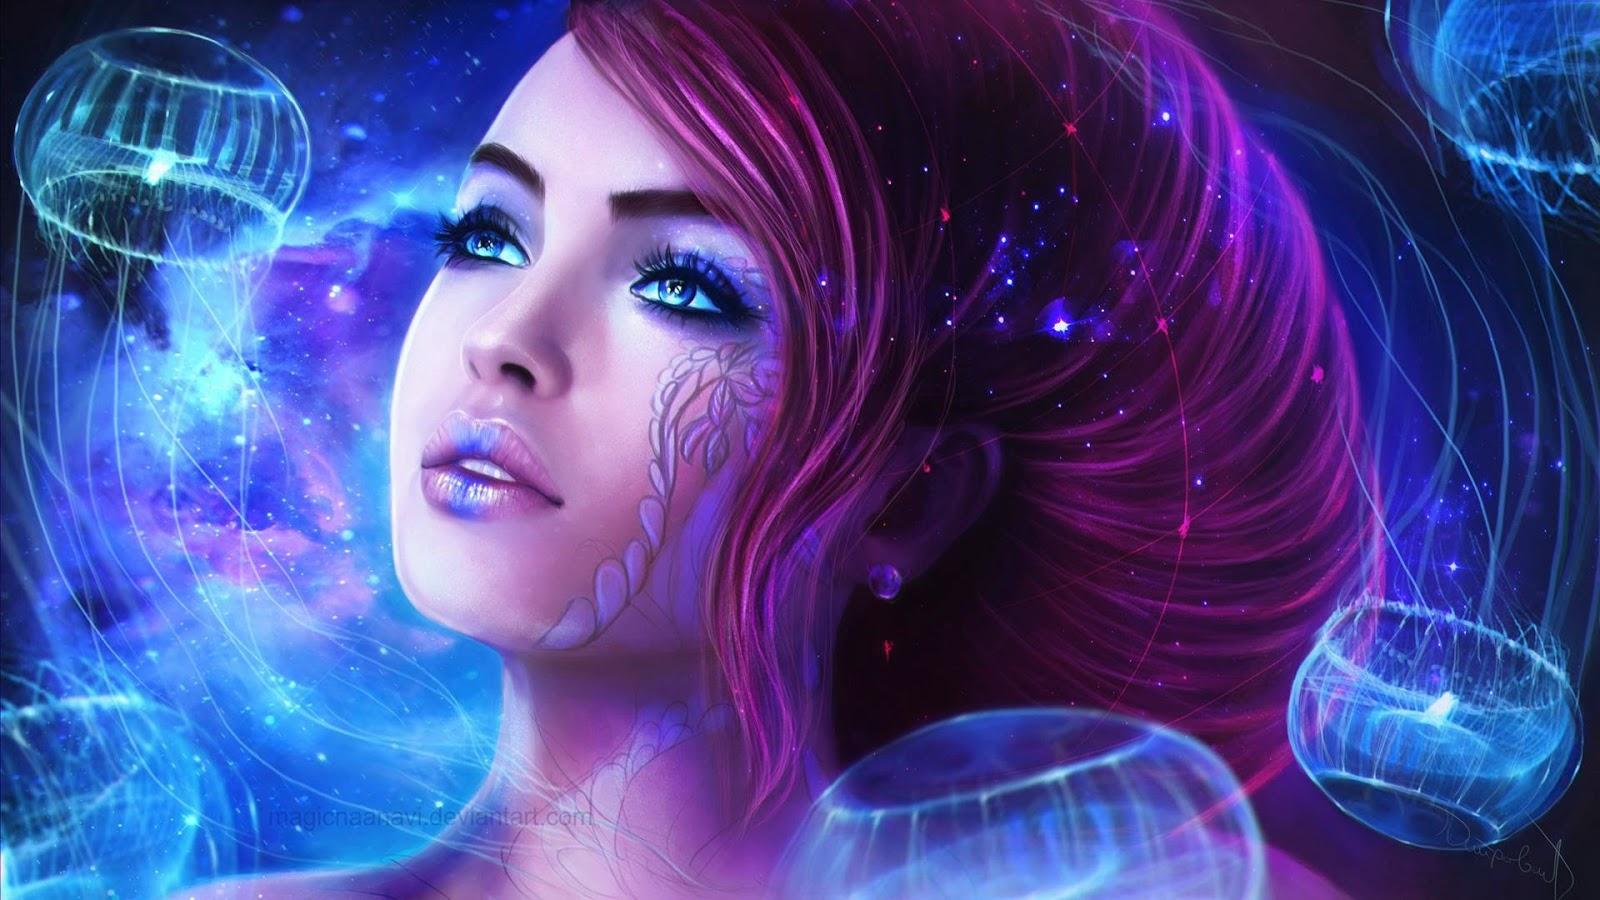 Divyatattva astrology free horoscopes psychic tarot yoga - Galaxy wallpaper for girls ...